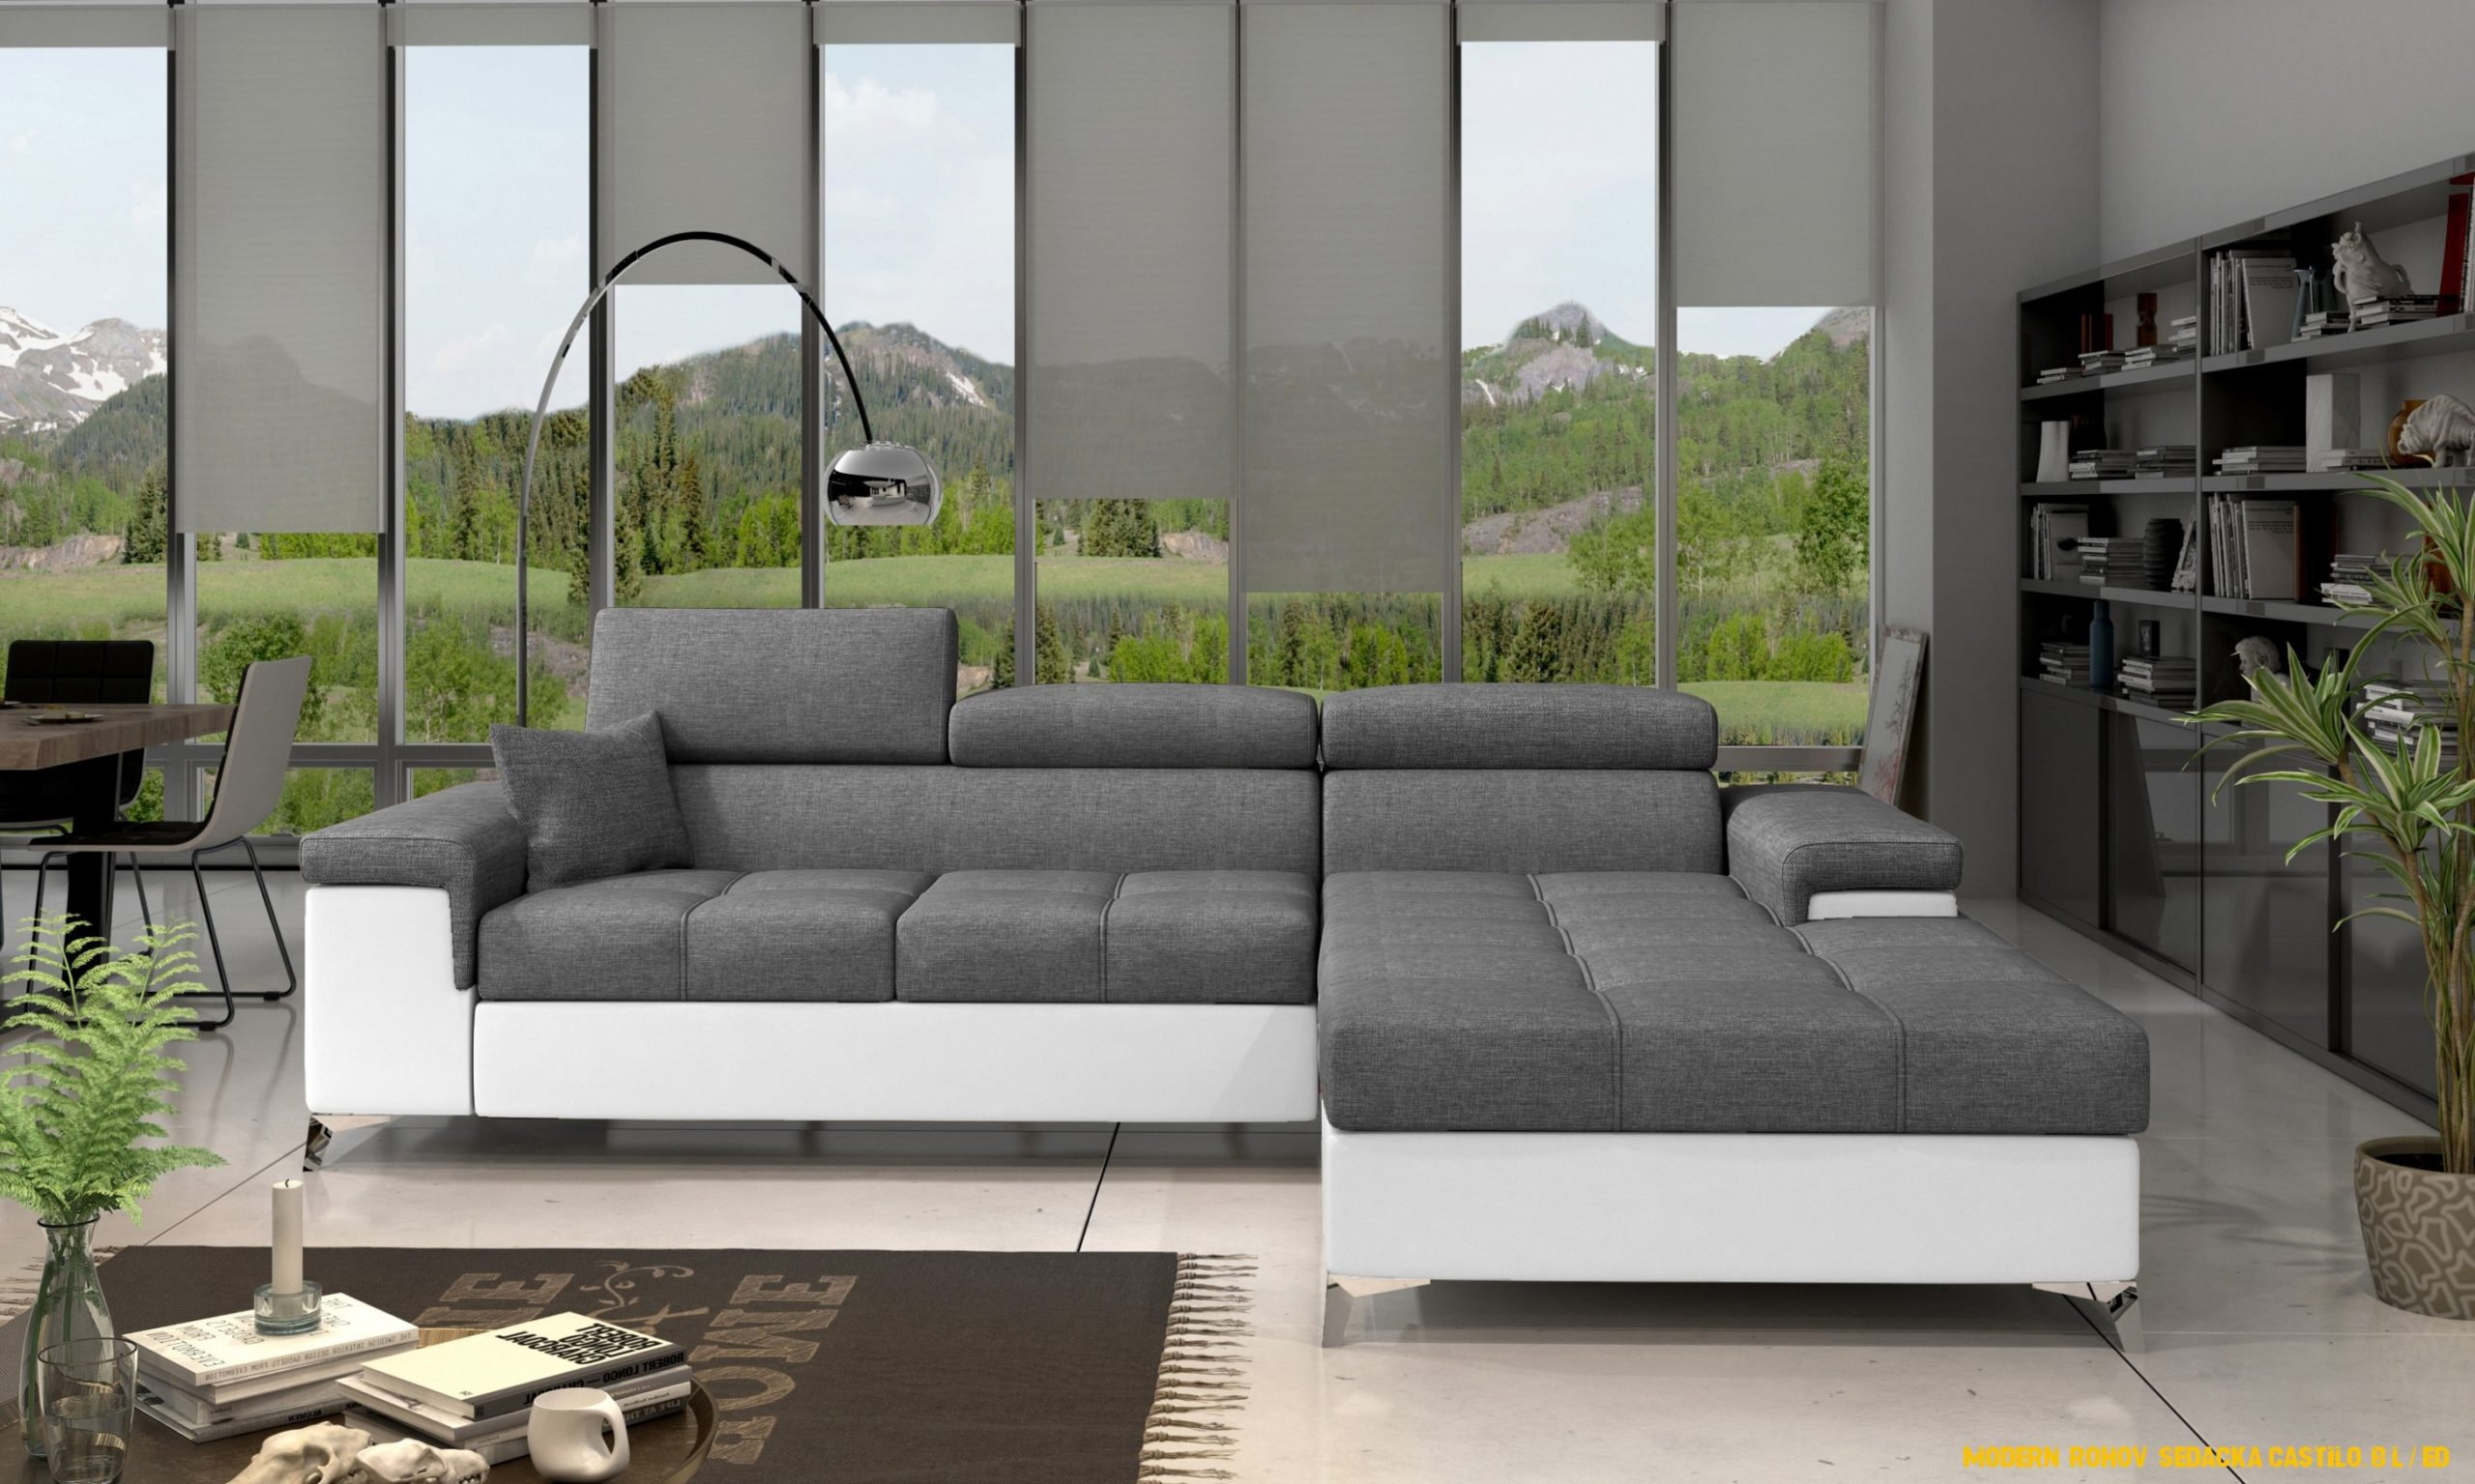 Moderní rohová sedacka Castilo, bílá / šedá